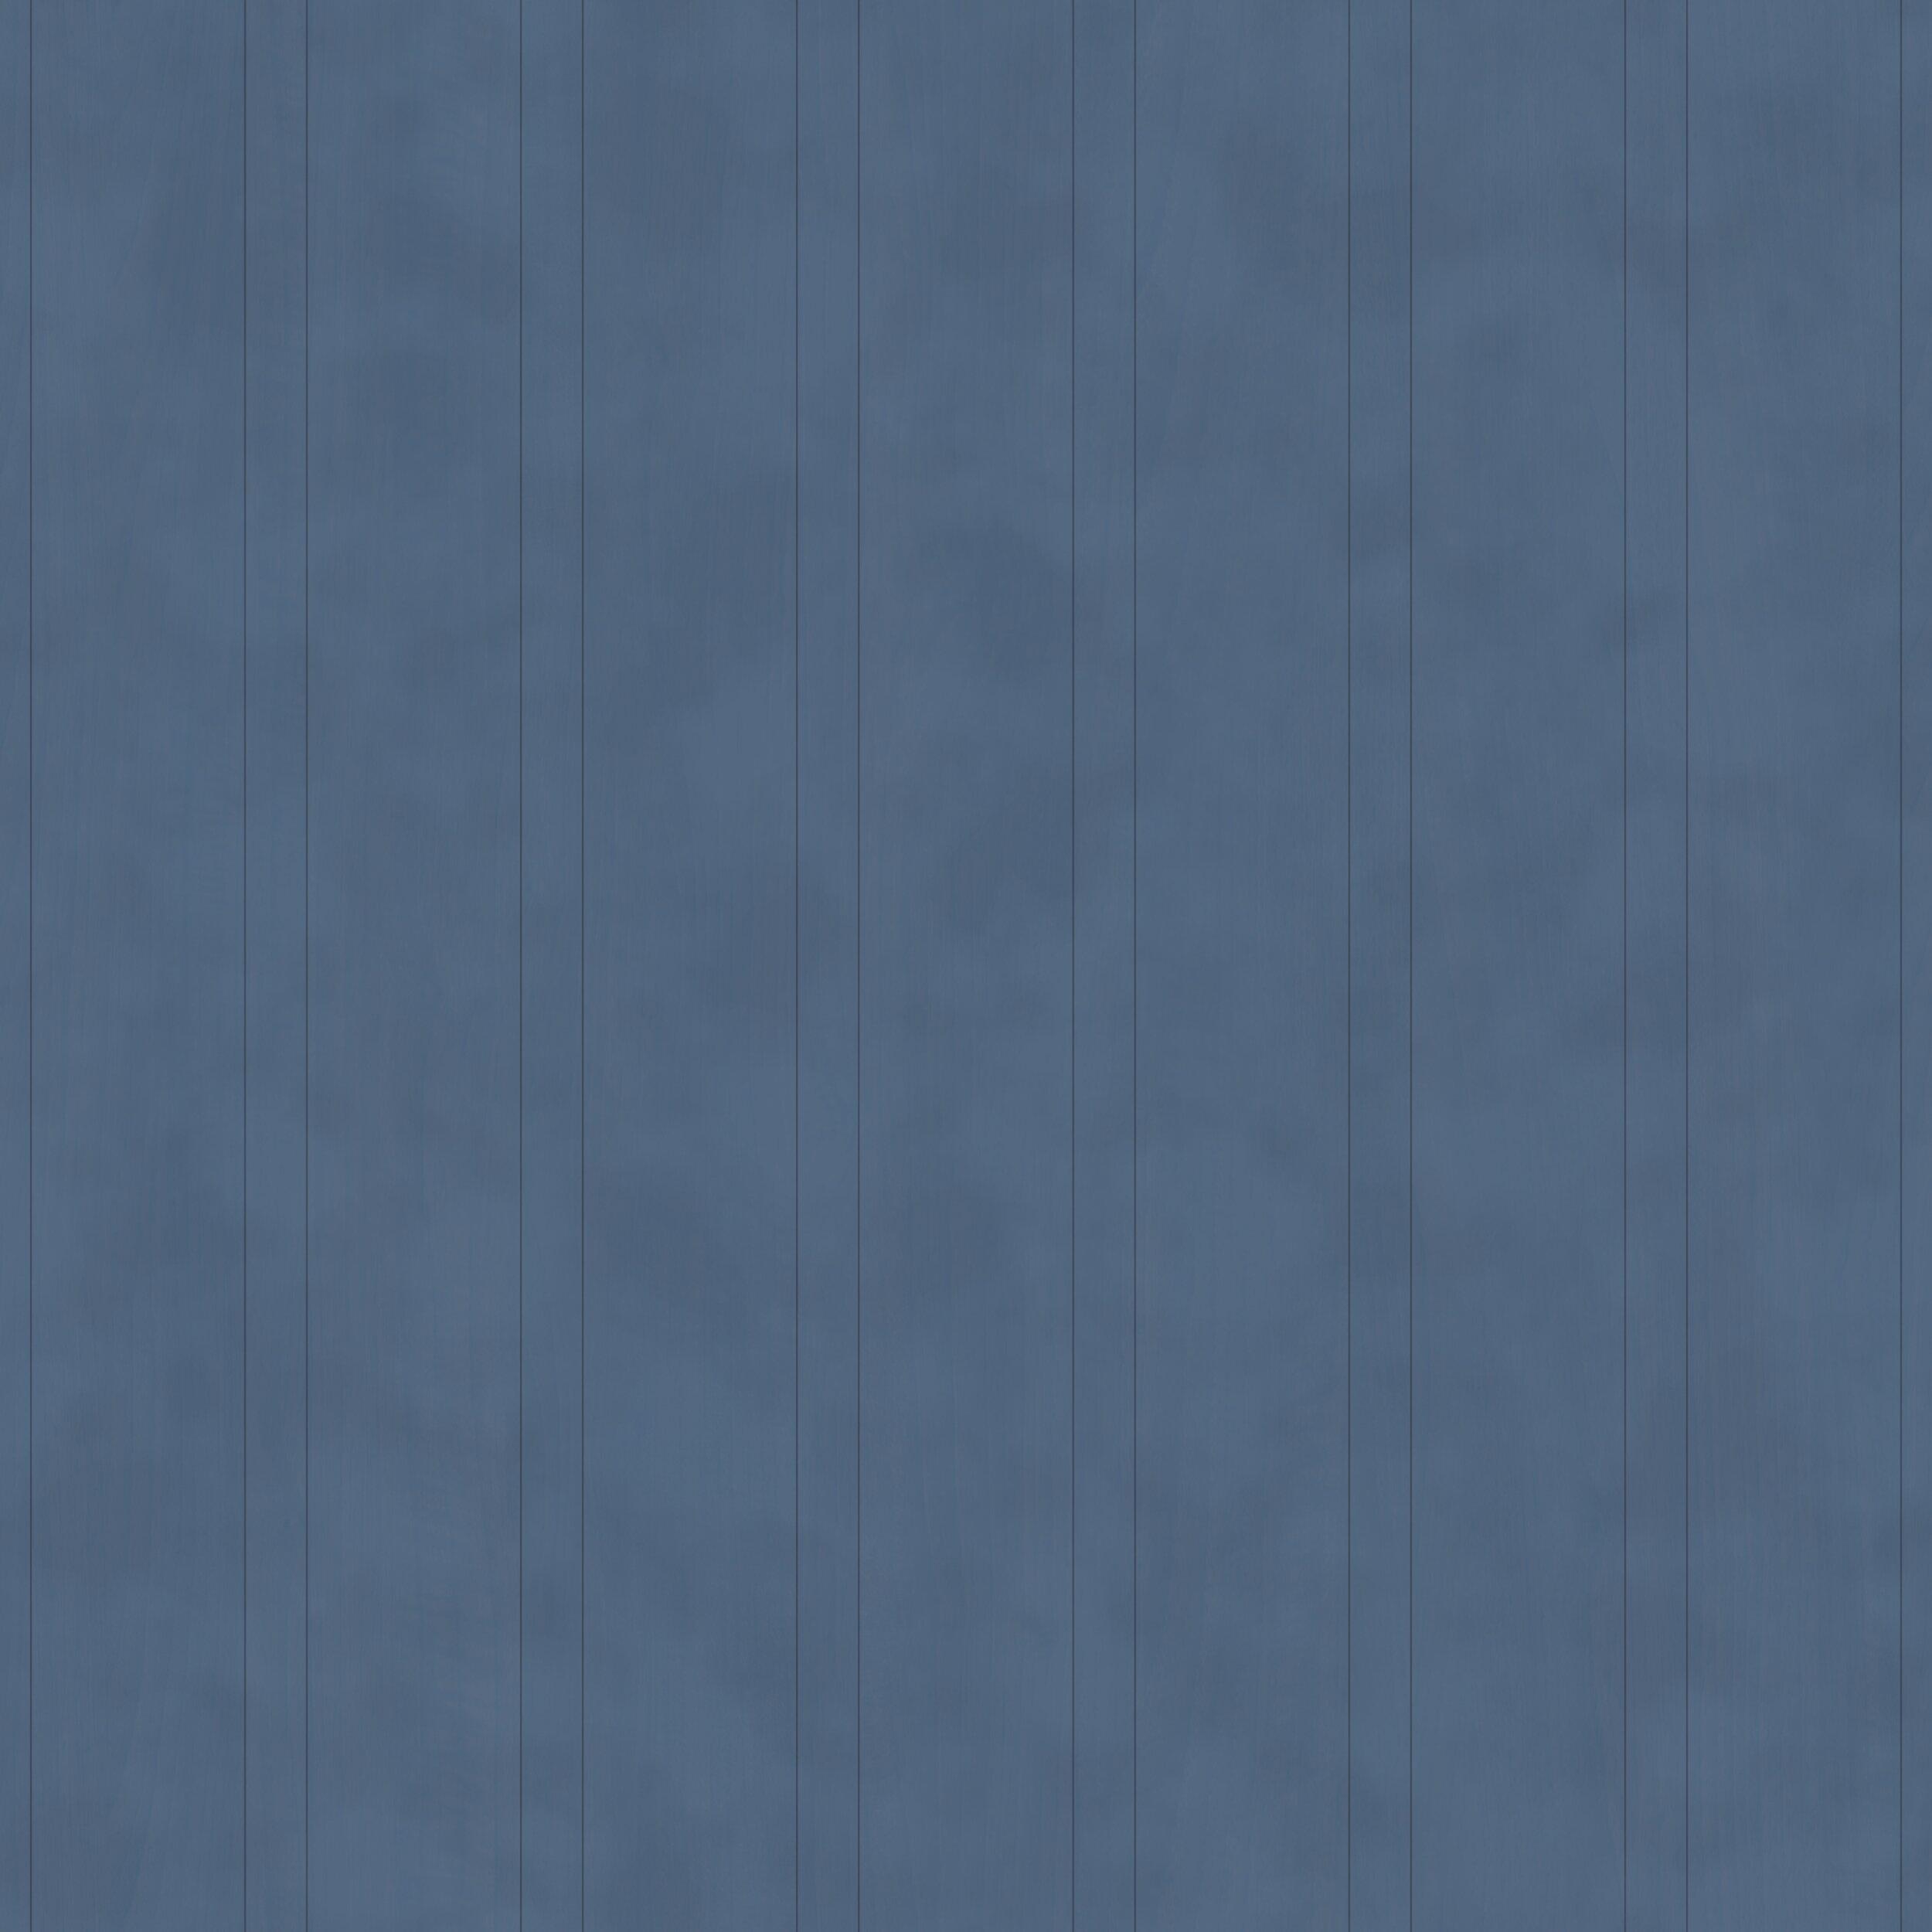 Siding_AI_01B_Blue_COLOR.jpg